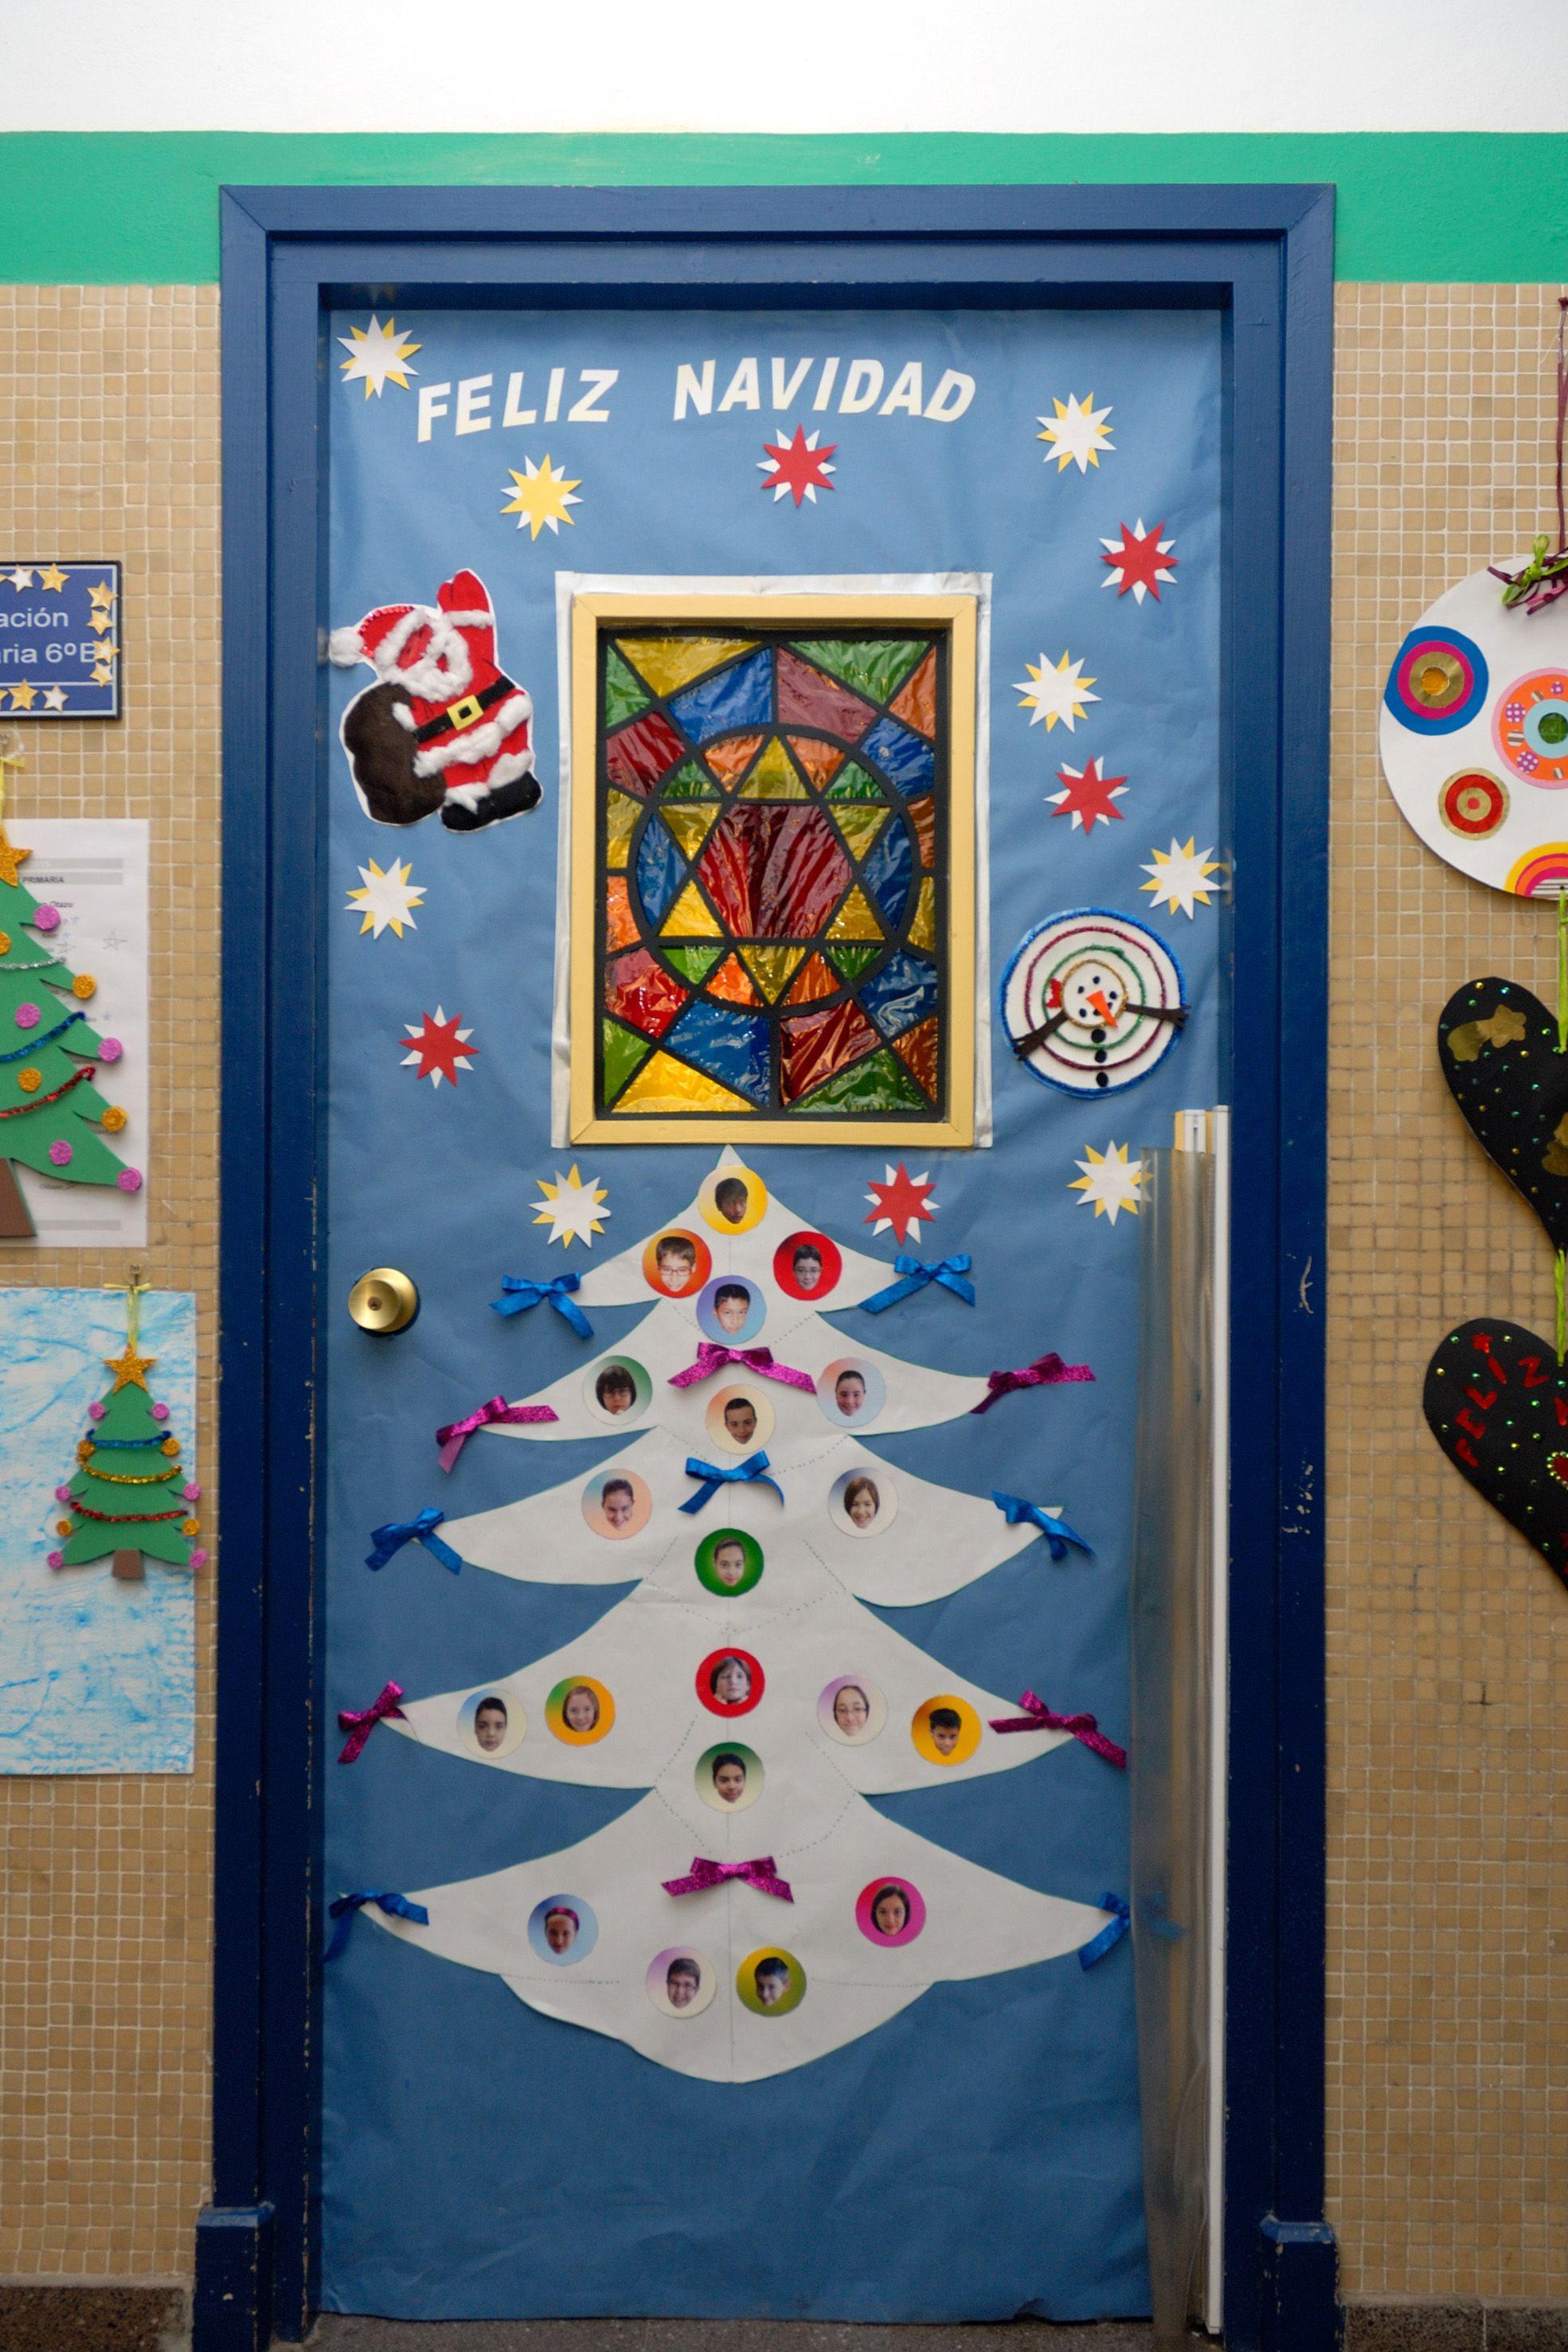 Puertas navide as decoradas tema regalos buscar con for Puertas decoradas con dinosaurios